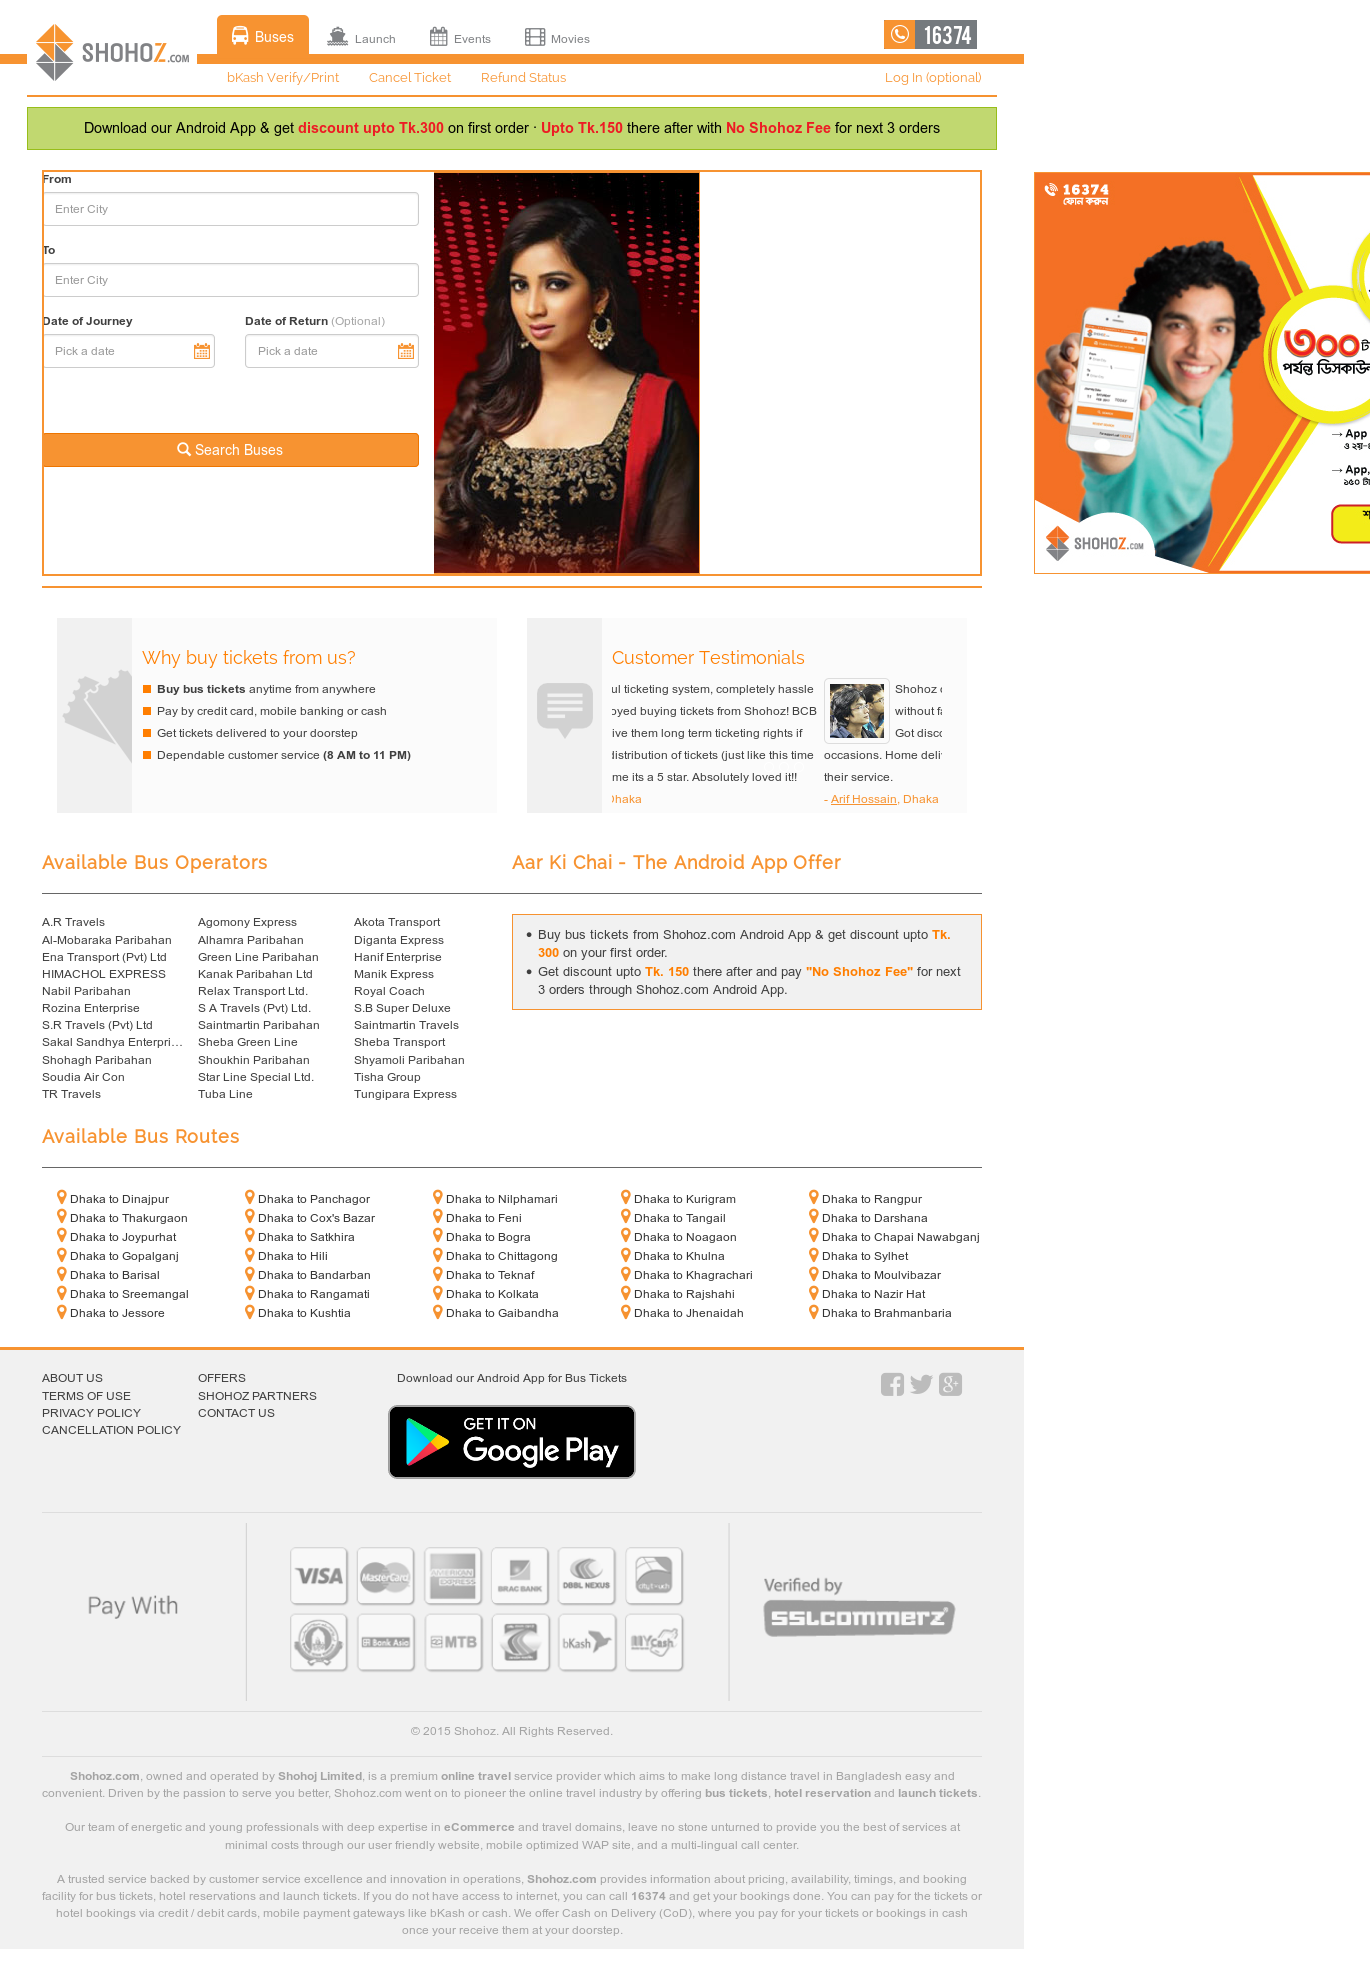 Shohoz Competitors, Revenue and Employees - Owler Company Profile